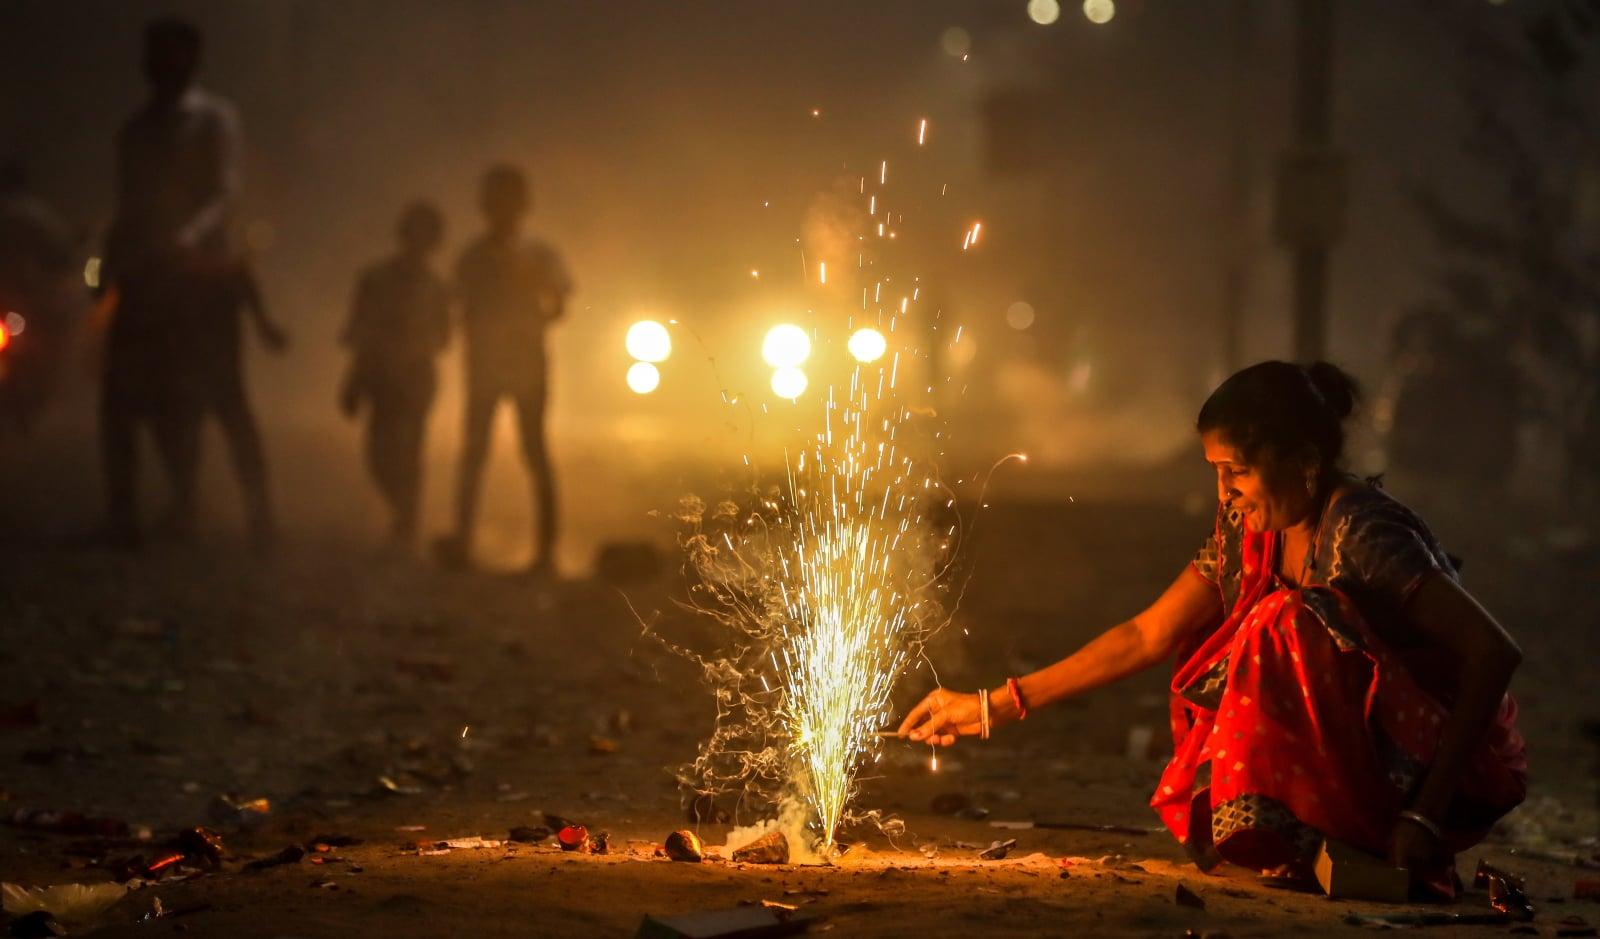 Festiwal Diwali w Ahmadabadzie, Indie. Fot. PAP/EPA/DIVYAKANT SOLANKI